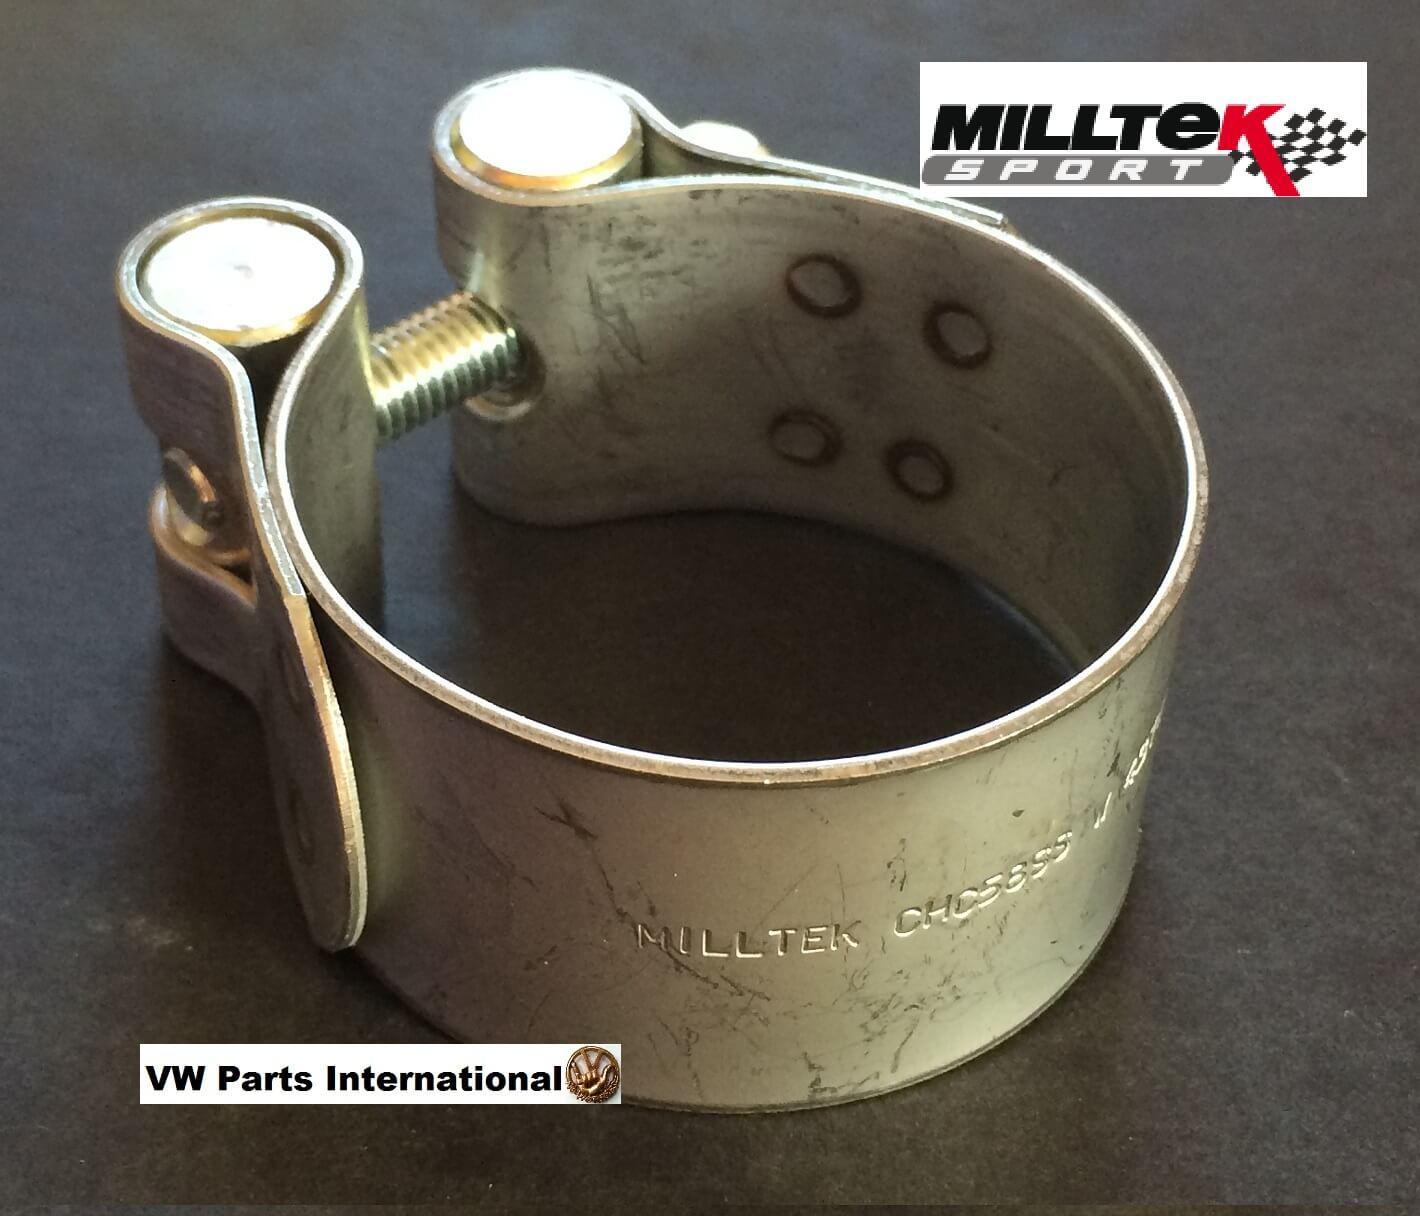 Milltek Sport Exhaust Clamp Ø54mm For Milltek 54mm System Pipe & Trims Tail Tips